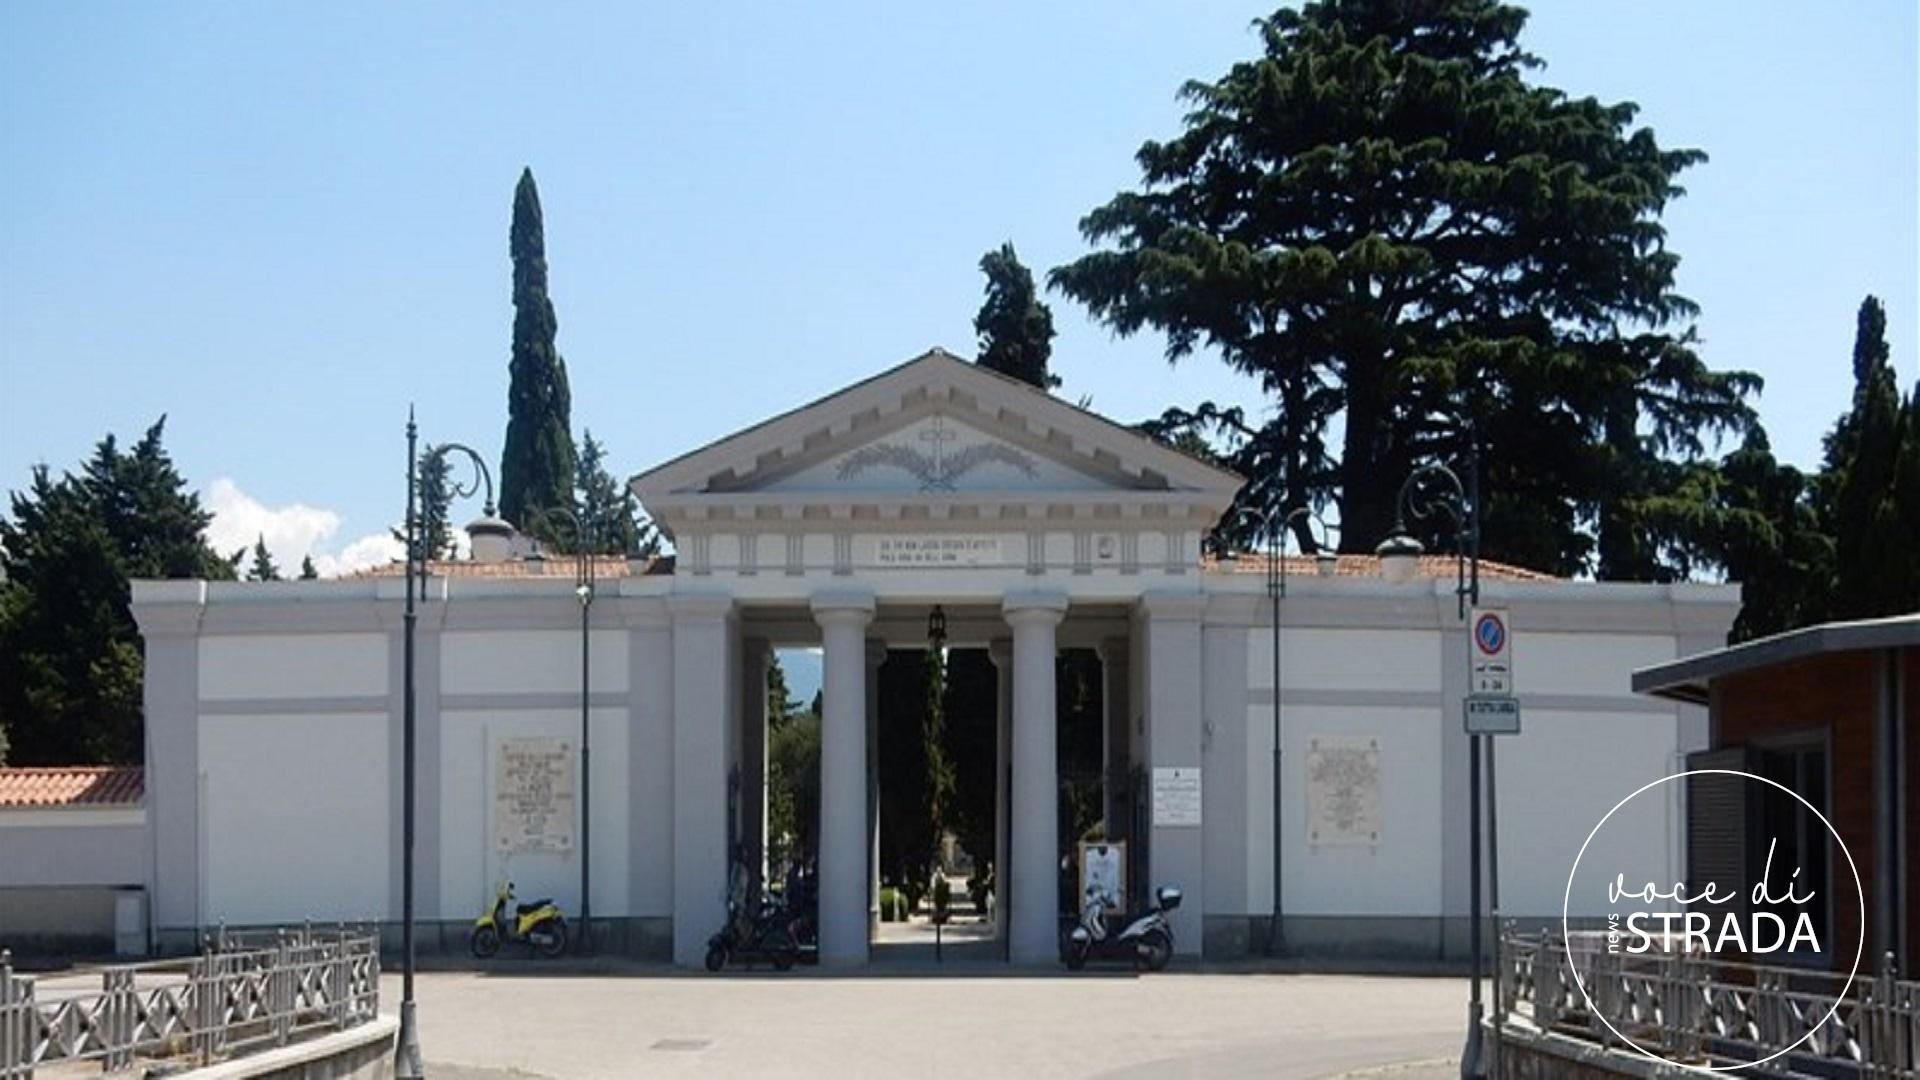 cimitero nocera